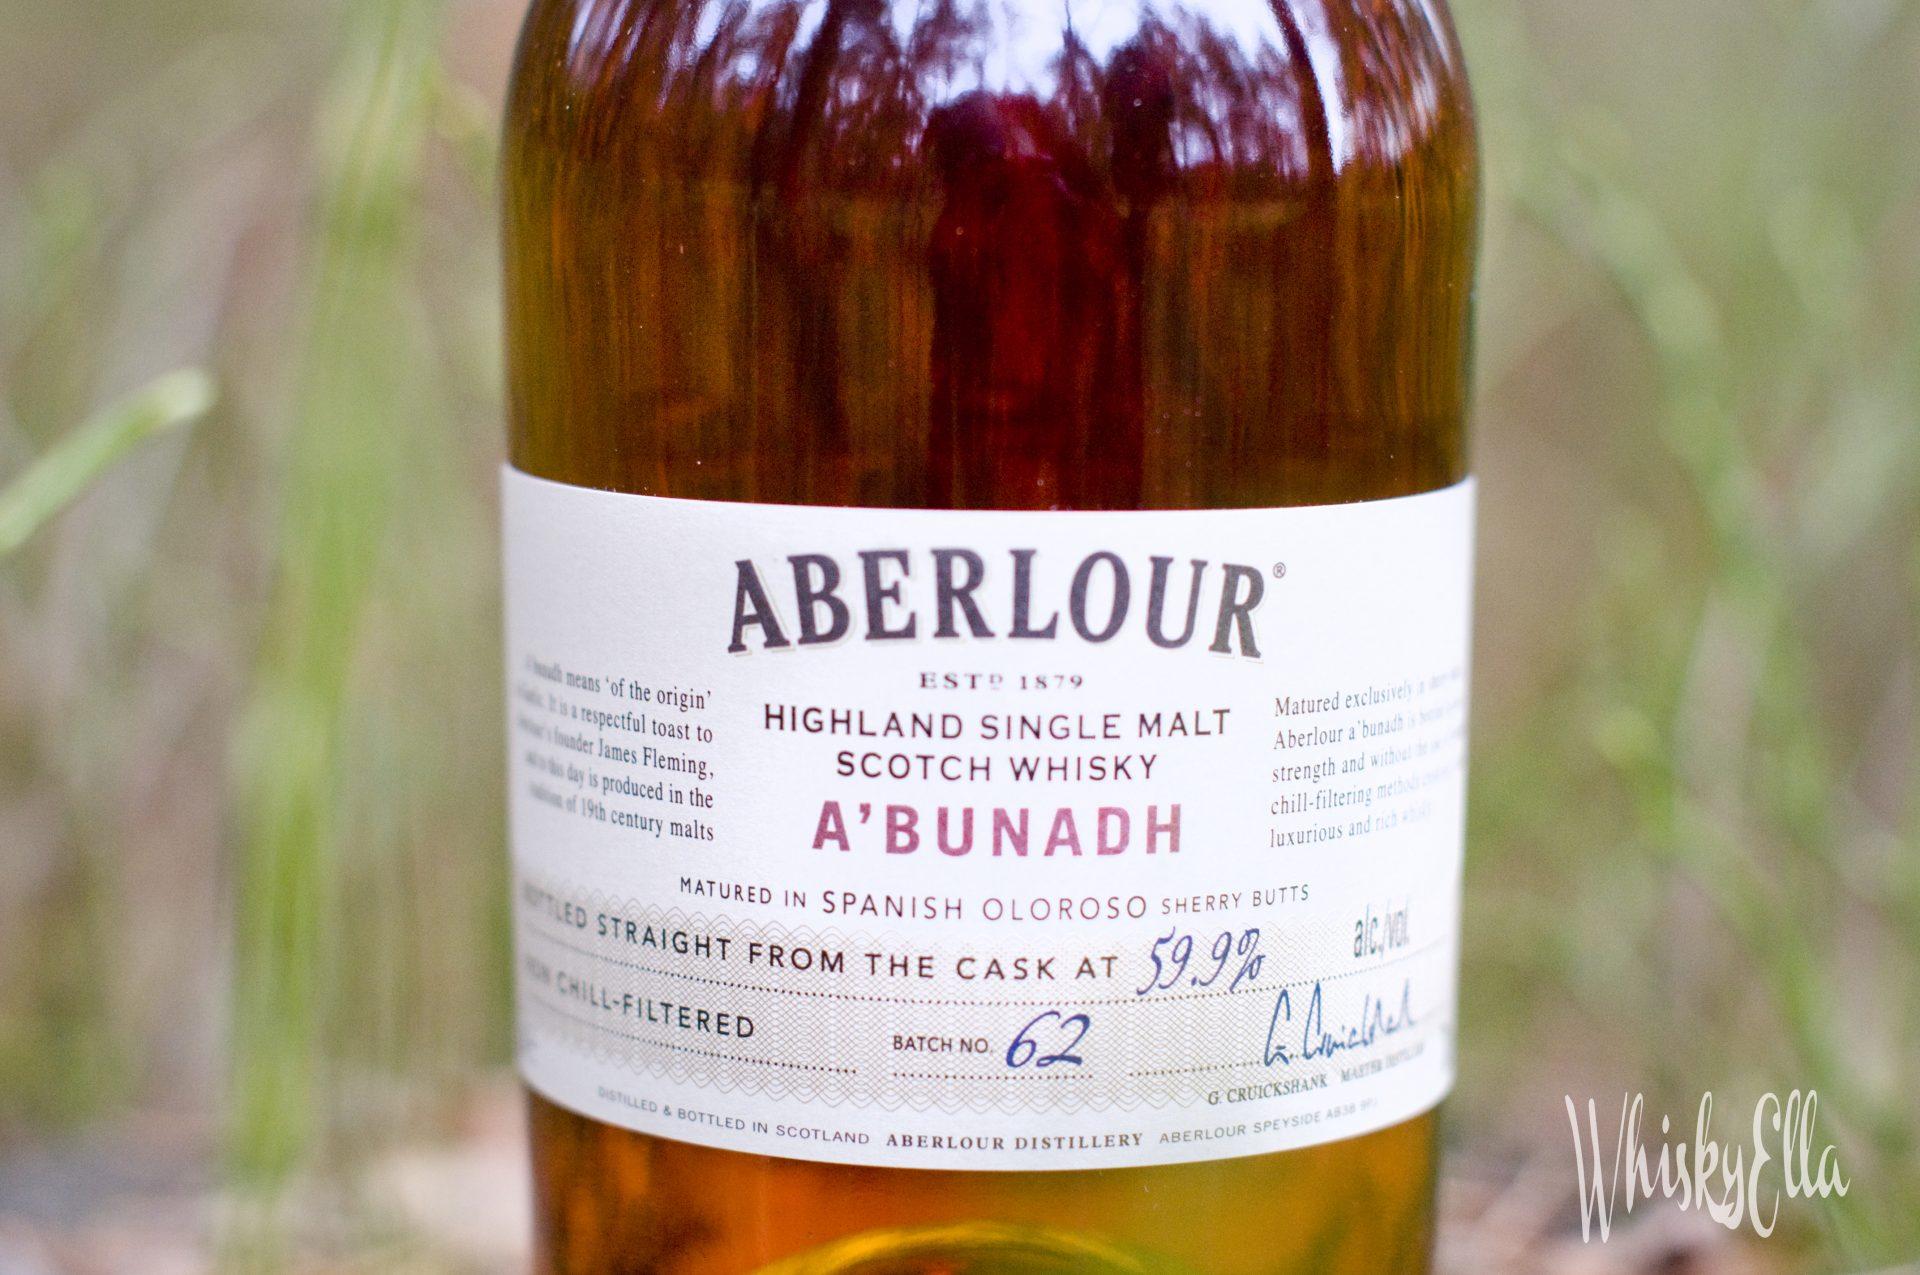 Nasza recenzja Aberlour A'bunadh batch no. 62 #46